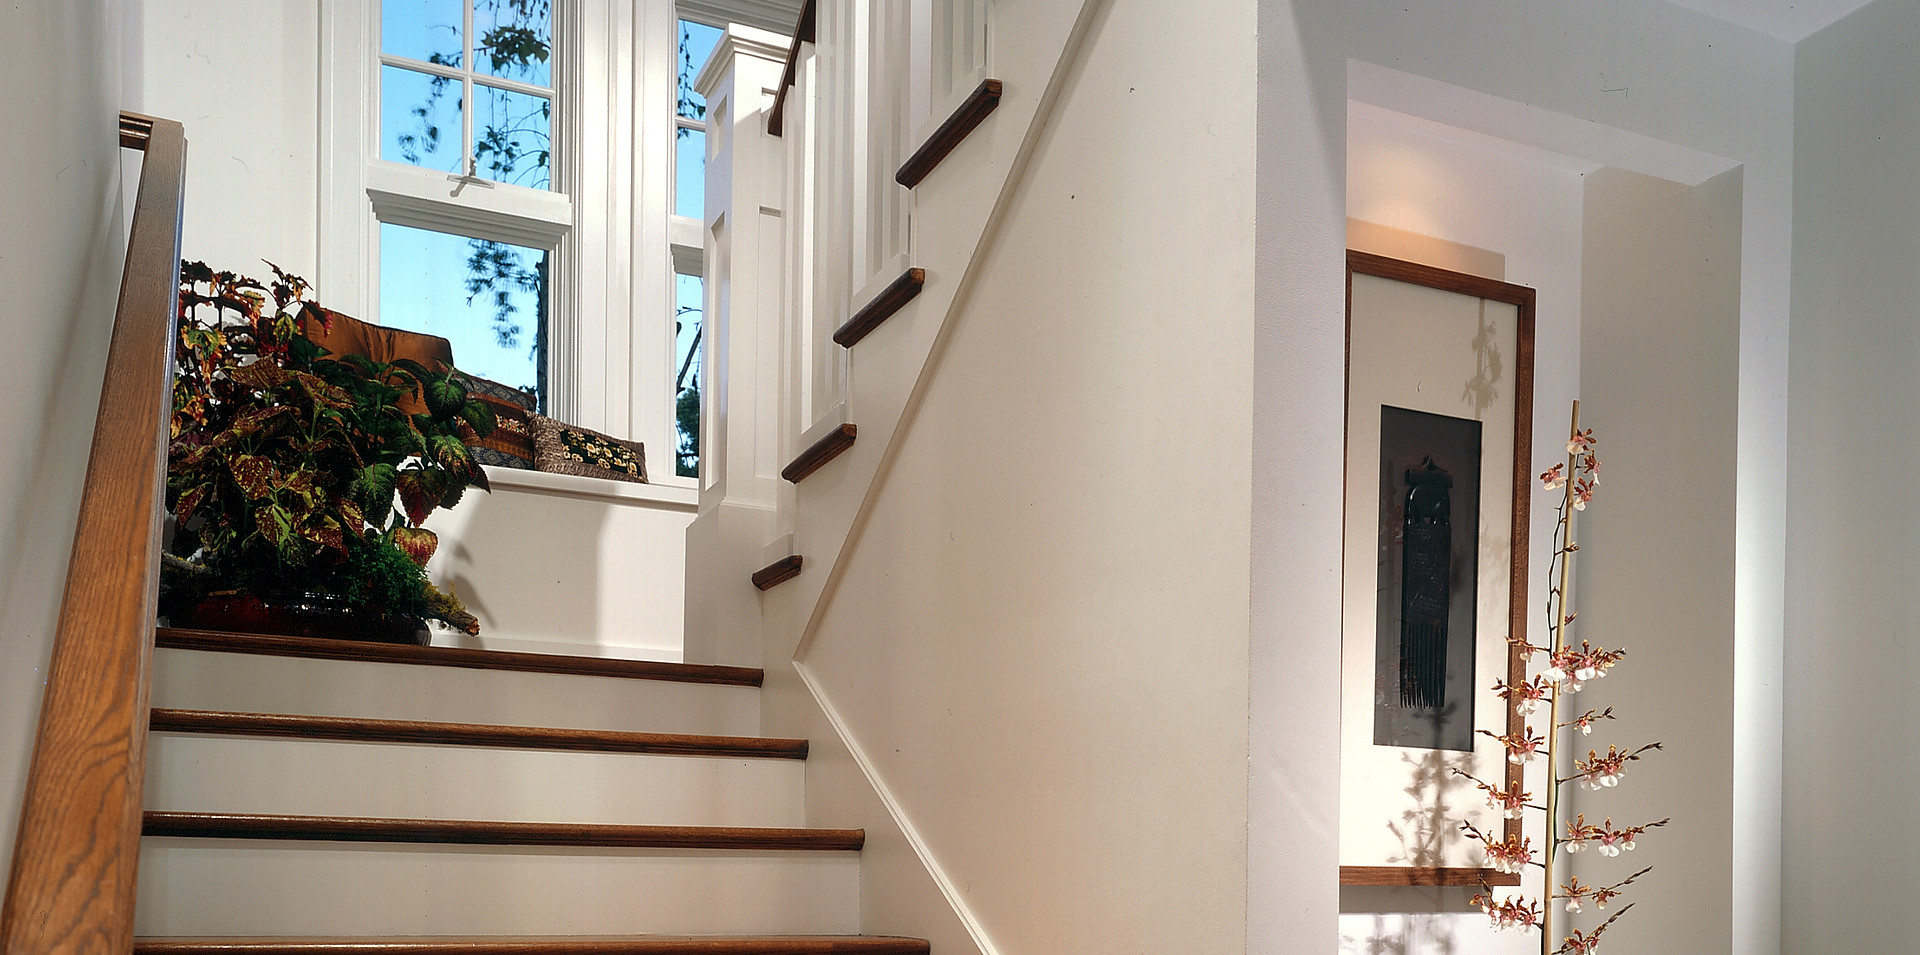 Stairwell-01.jpg